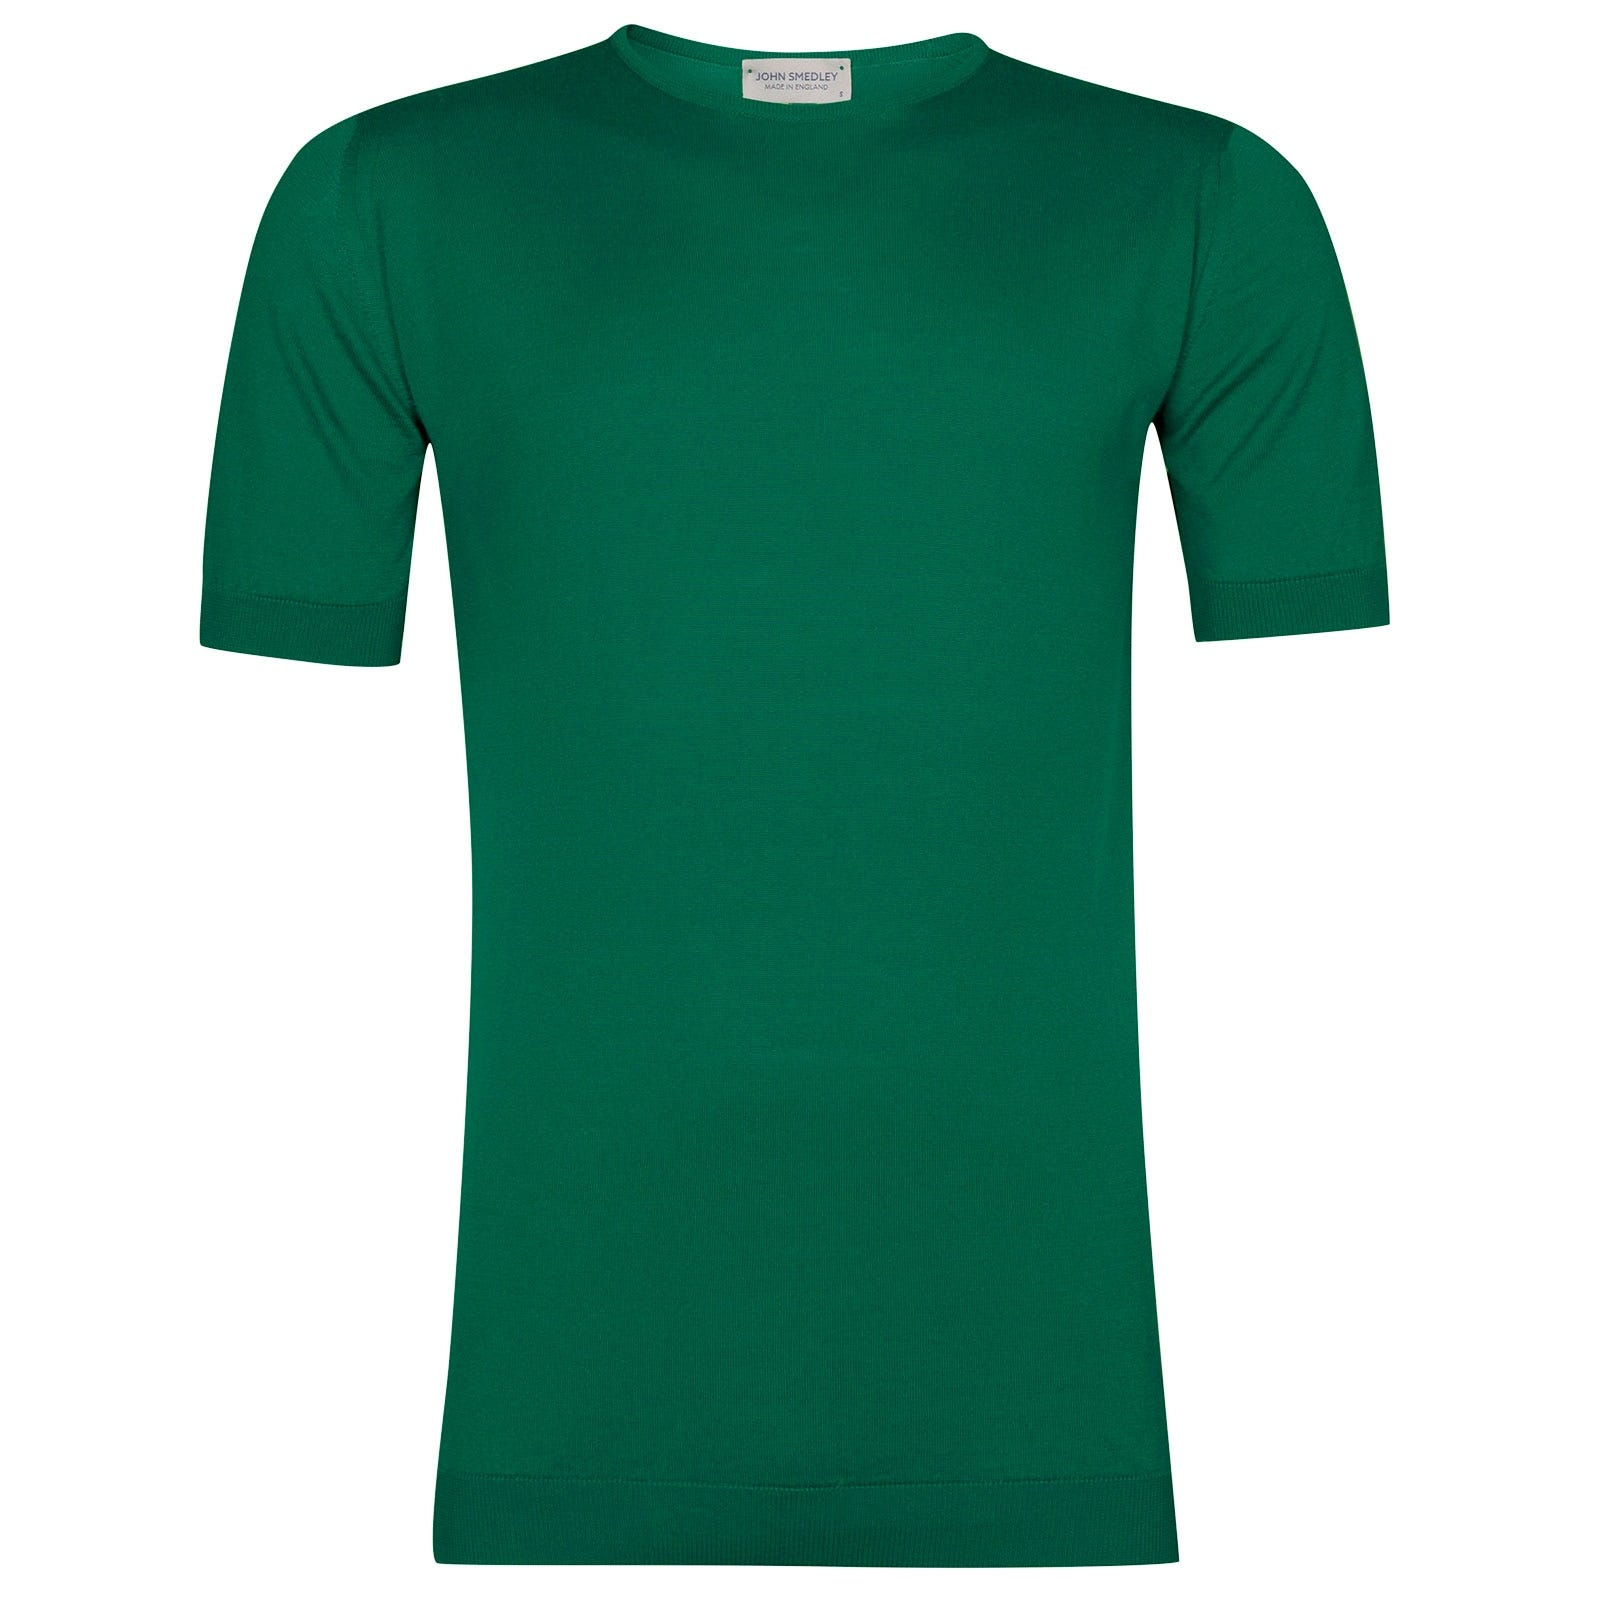 John Smedley Belden Sea Island Cotton T-shirt in Boron Green-S